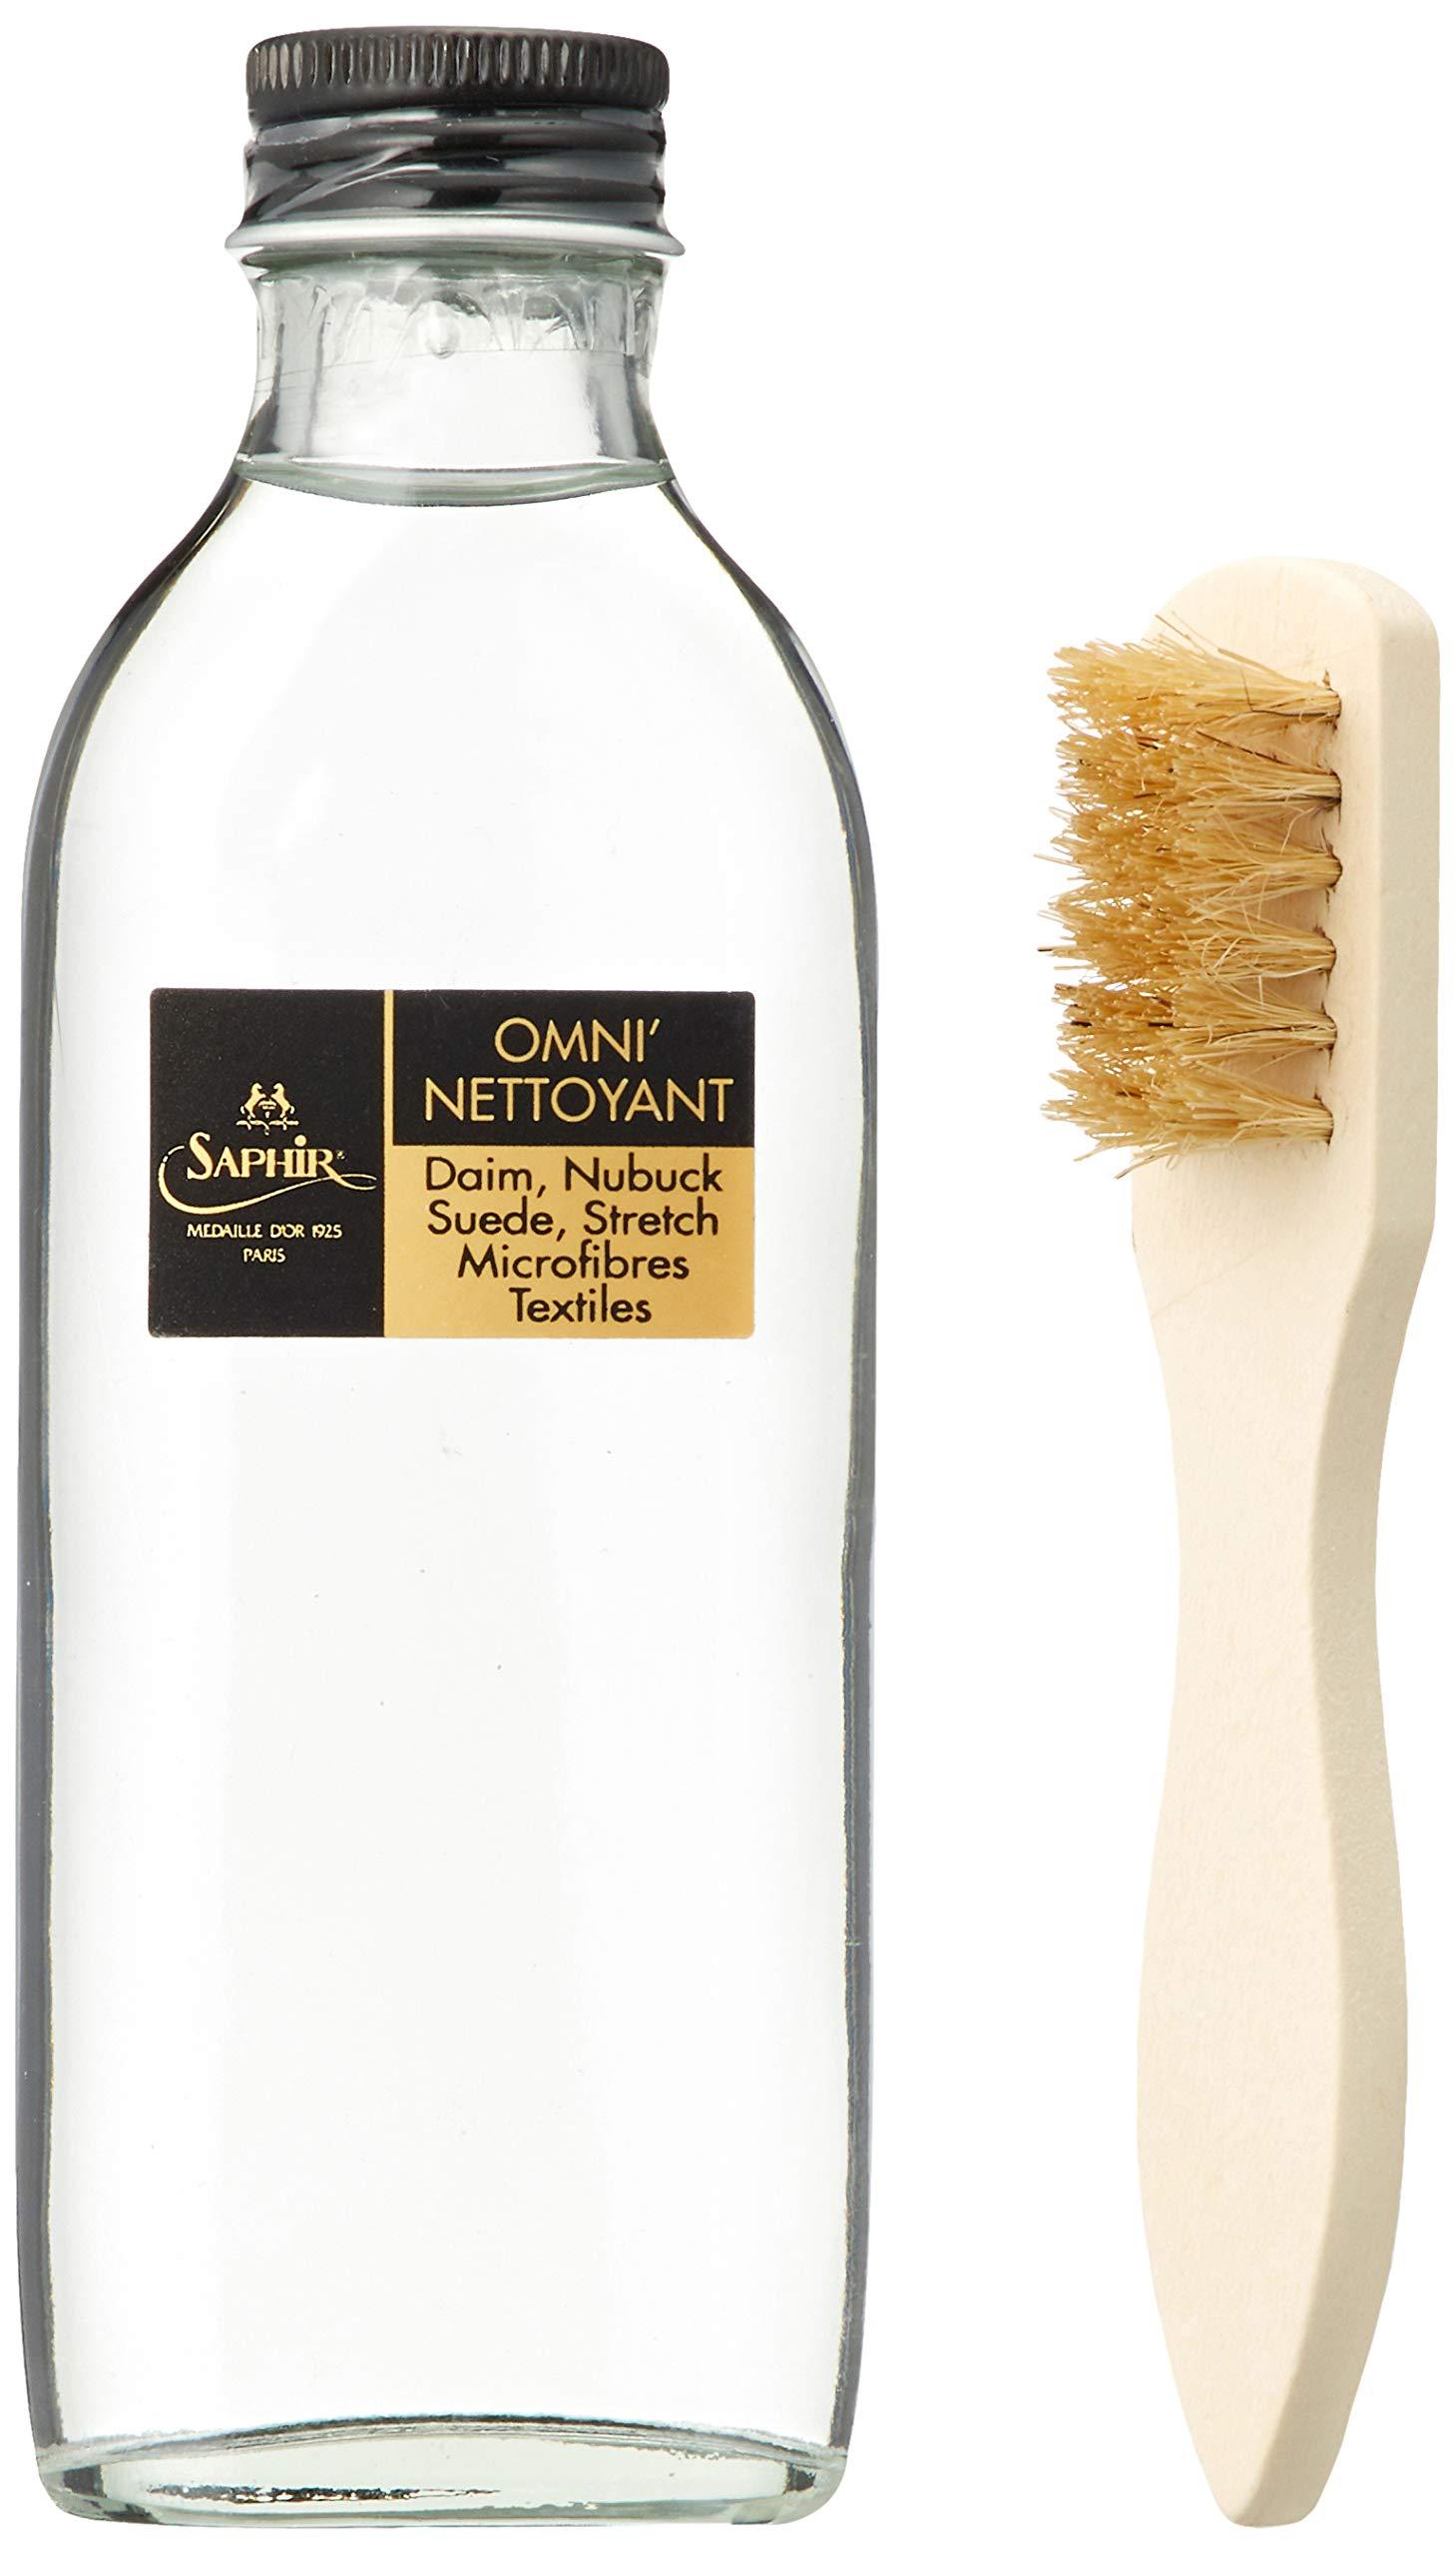 Saphir Medaille d'Or Omni'Nettoyant - Nubuck & Suede Cleaner Shoe Shampoo